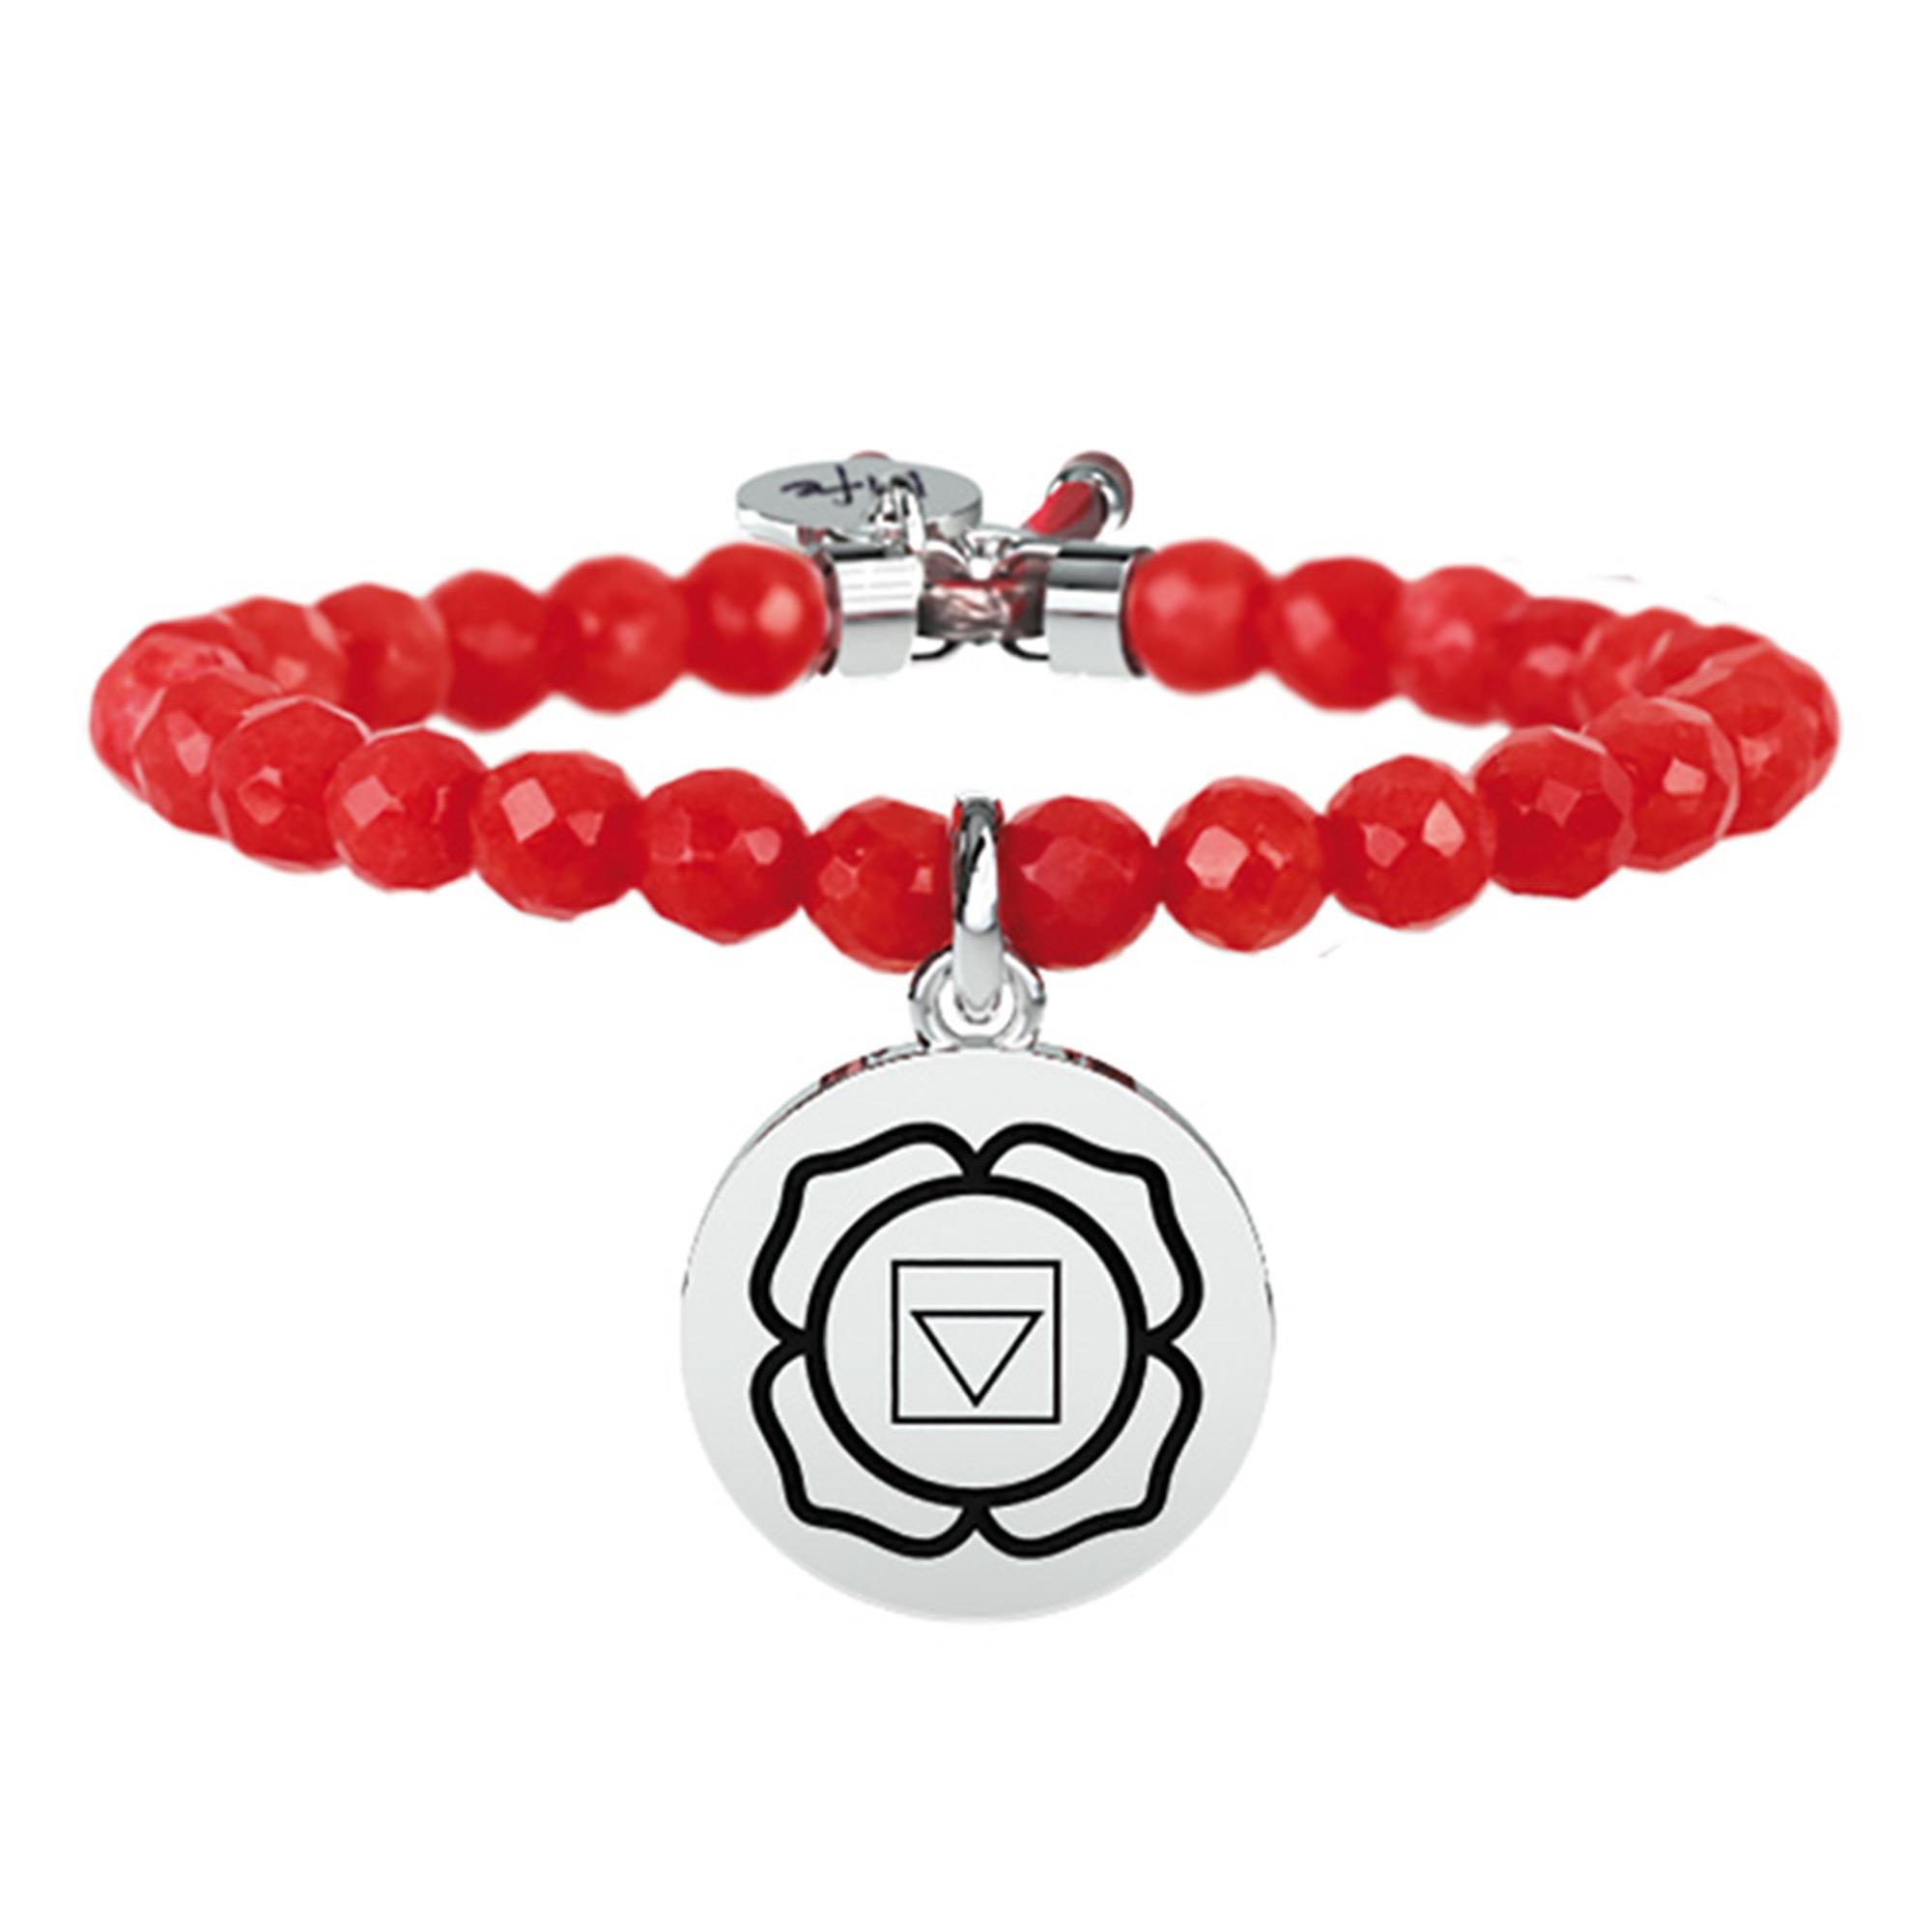 Bracciale Spirituality I Chakra Giada Rossa | Equilibrio - KIDULT